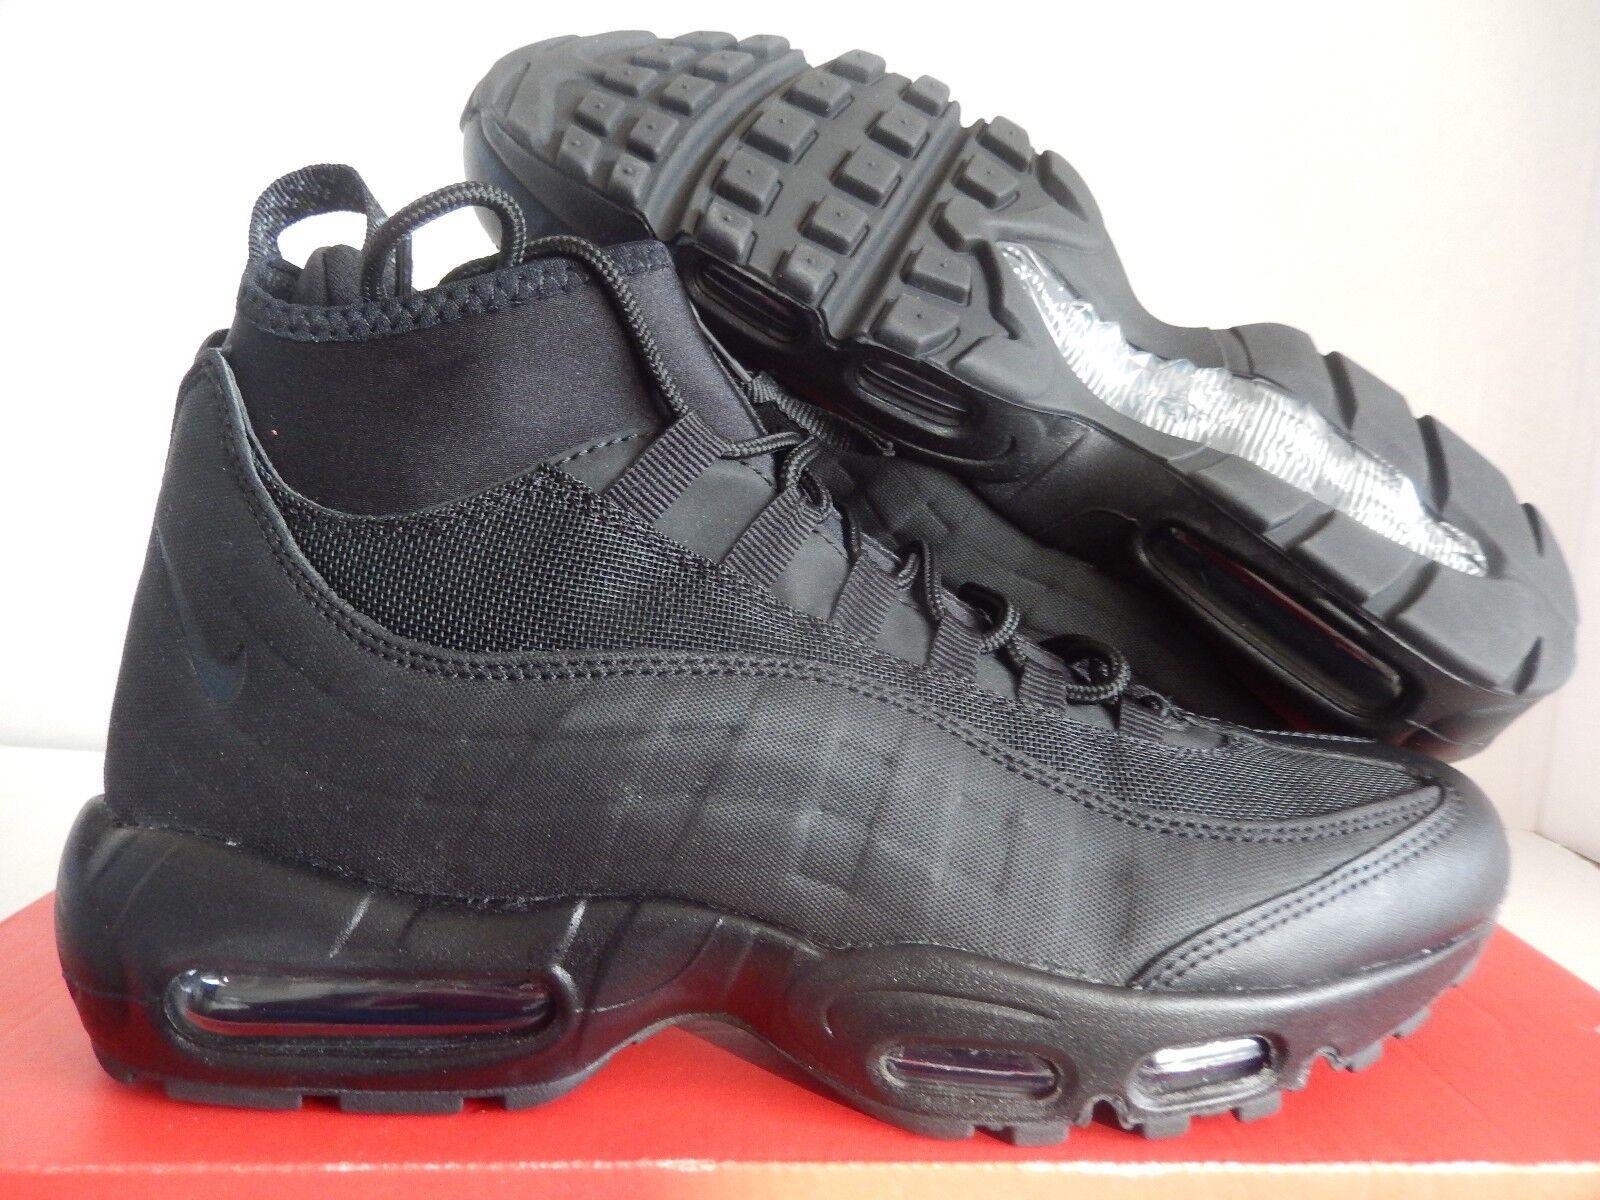 NIKE AIR MAX 95 SNEAKERBOOT BLACK-BLACK SZ 8 [806809-002]